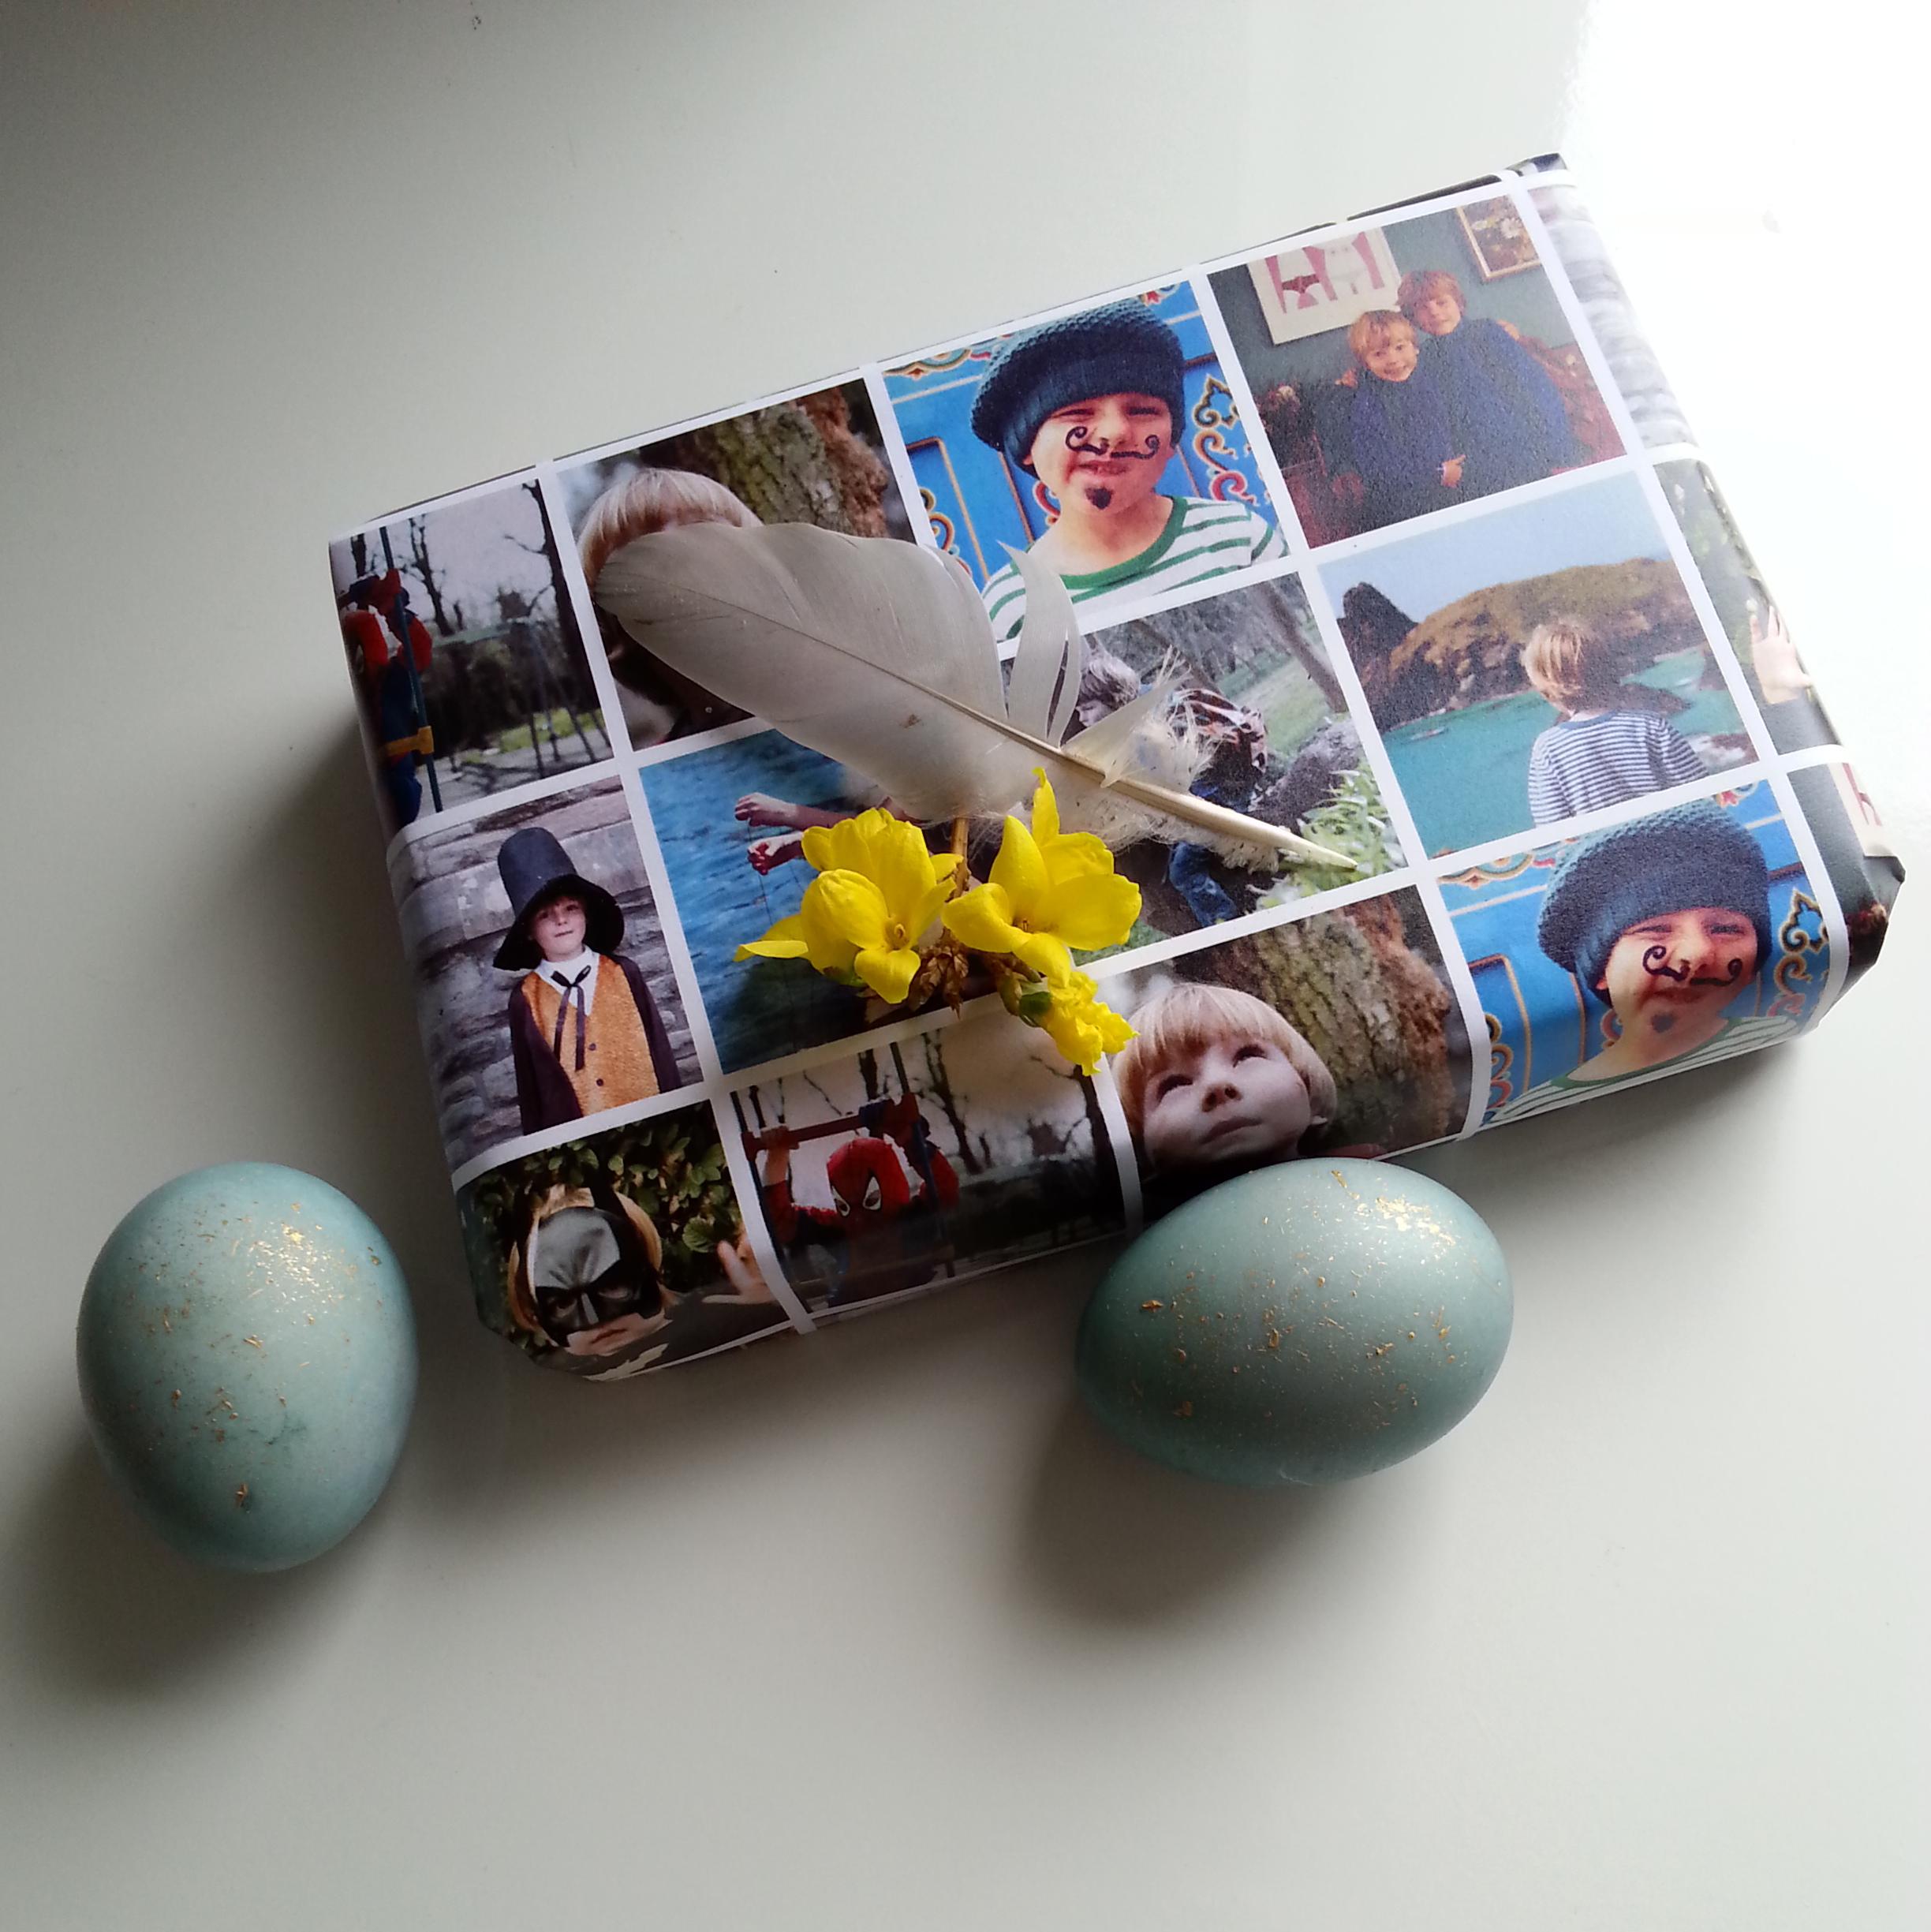 wrap, gifts, littlegreenshed, blog, post, easter